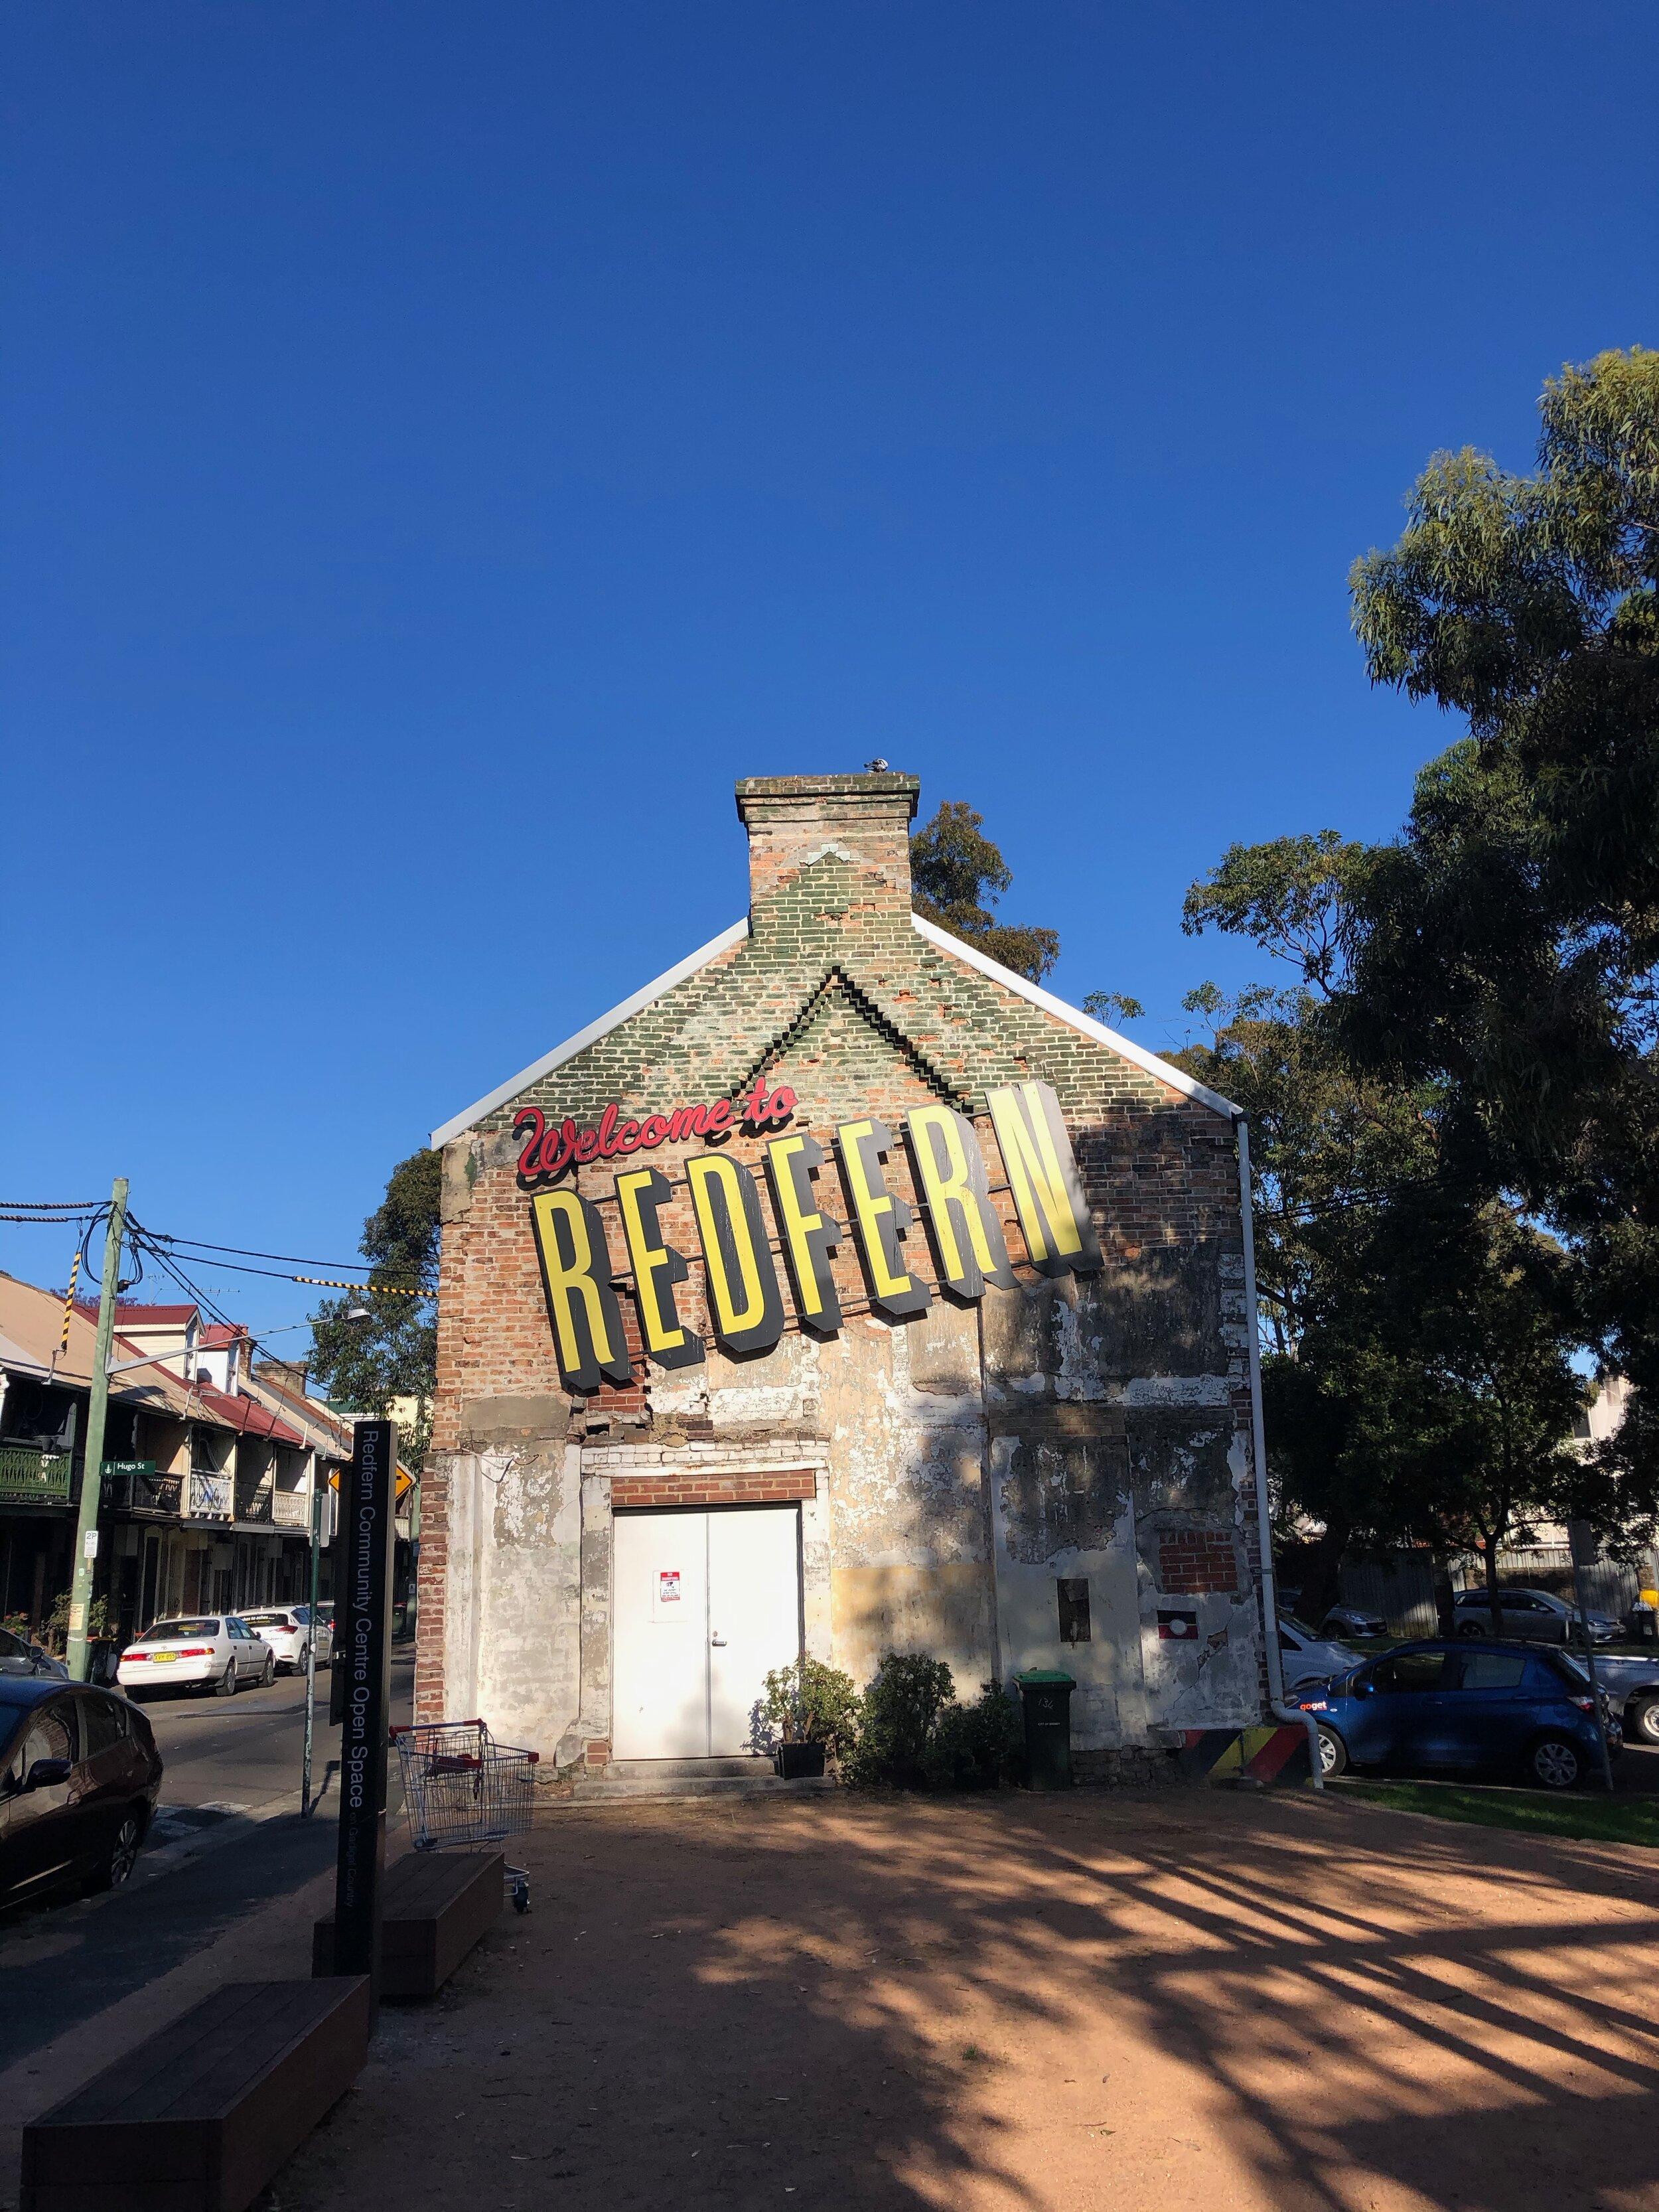 Redfern Sydney NSW